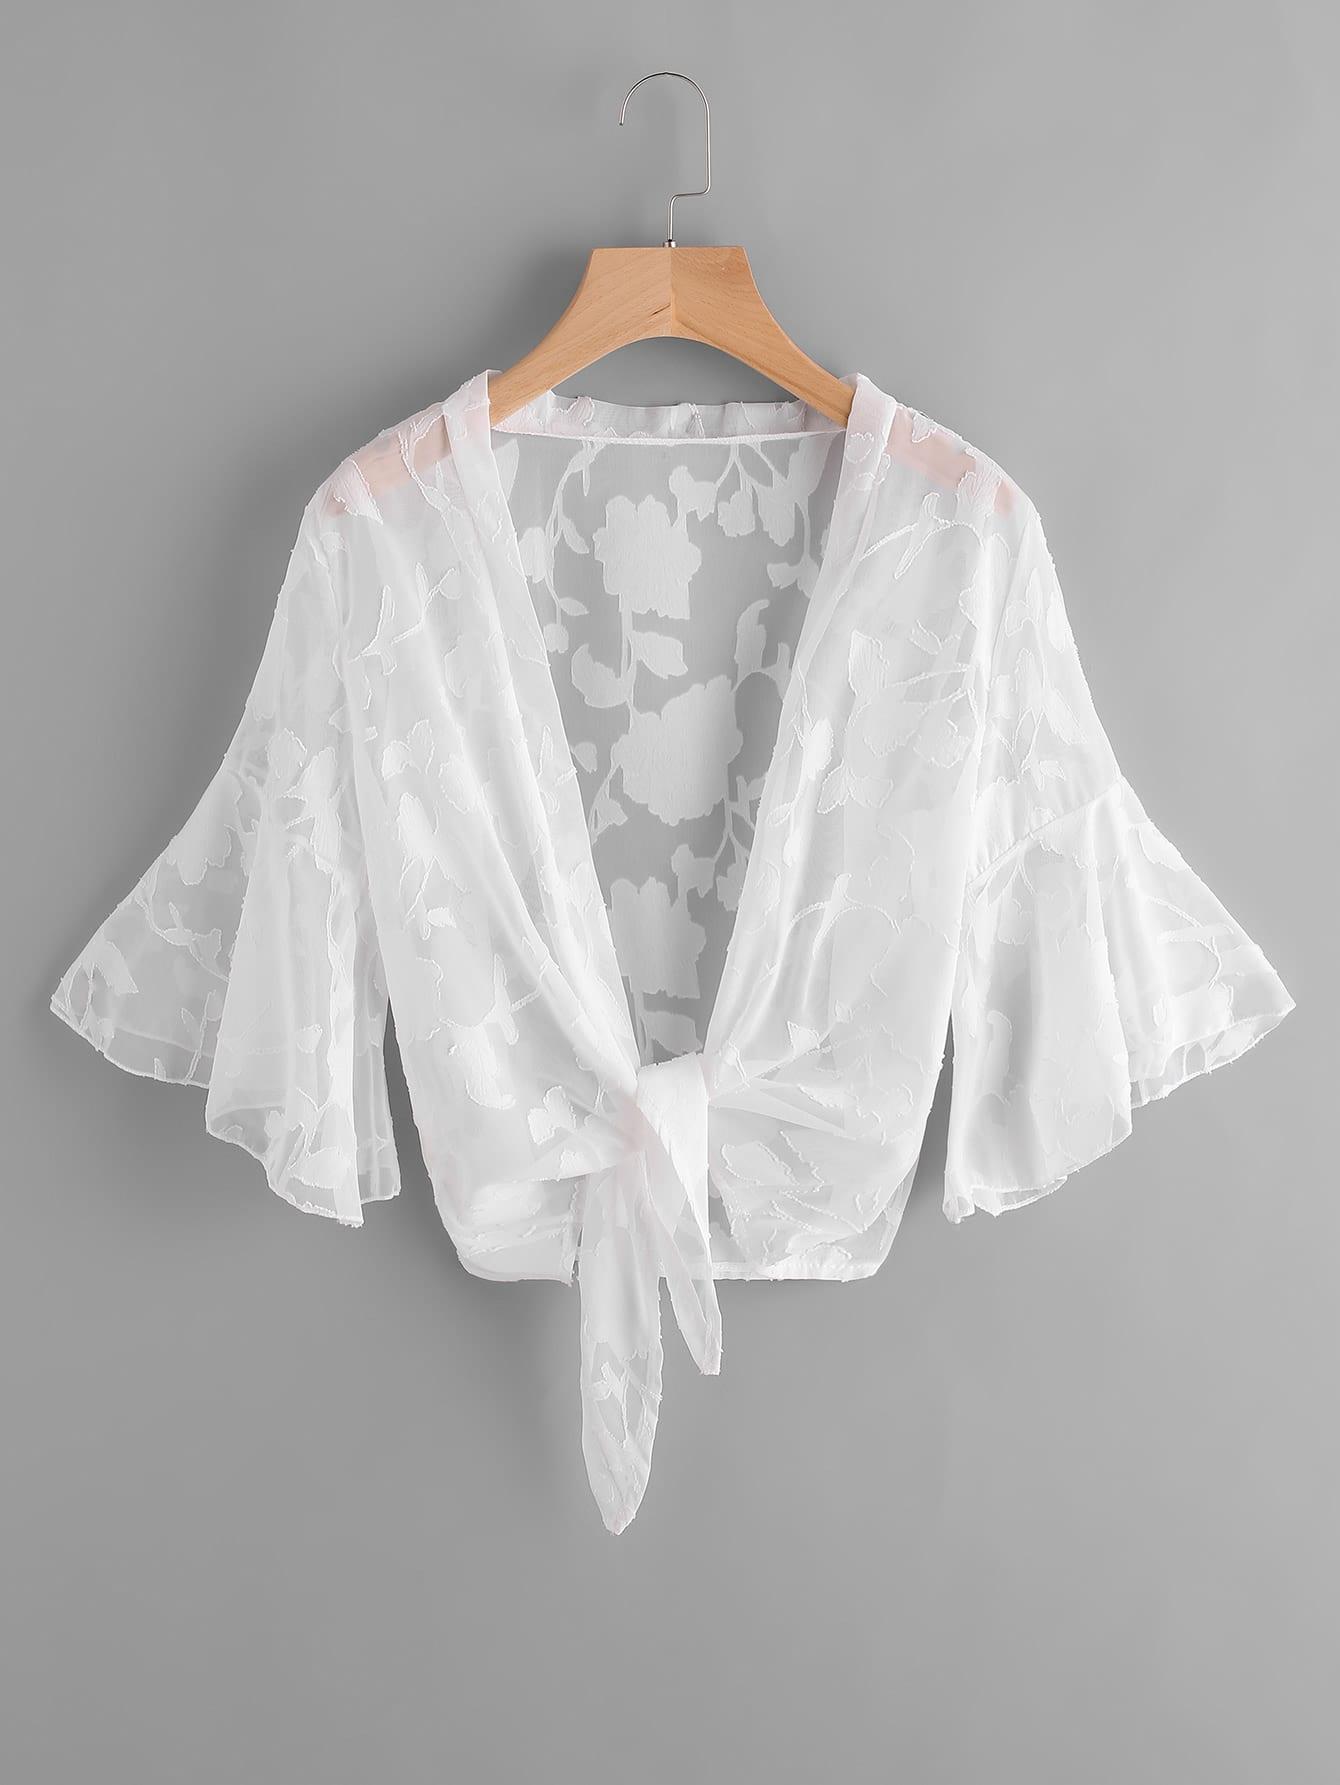 Image of Bell Sleeve Sheer Mesh Beach Kimono